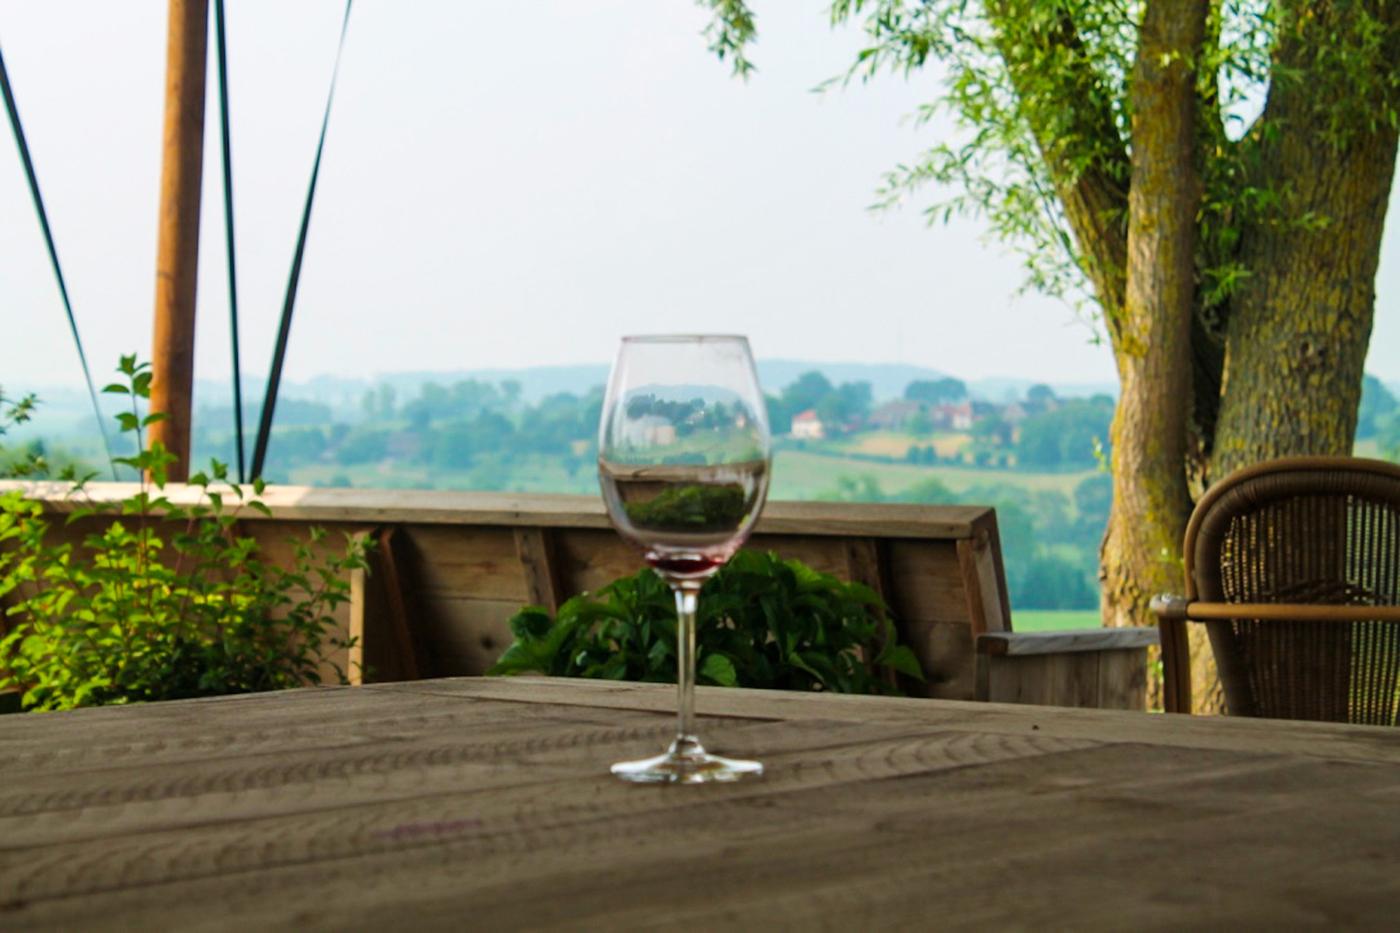 Wijnroute Limburg